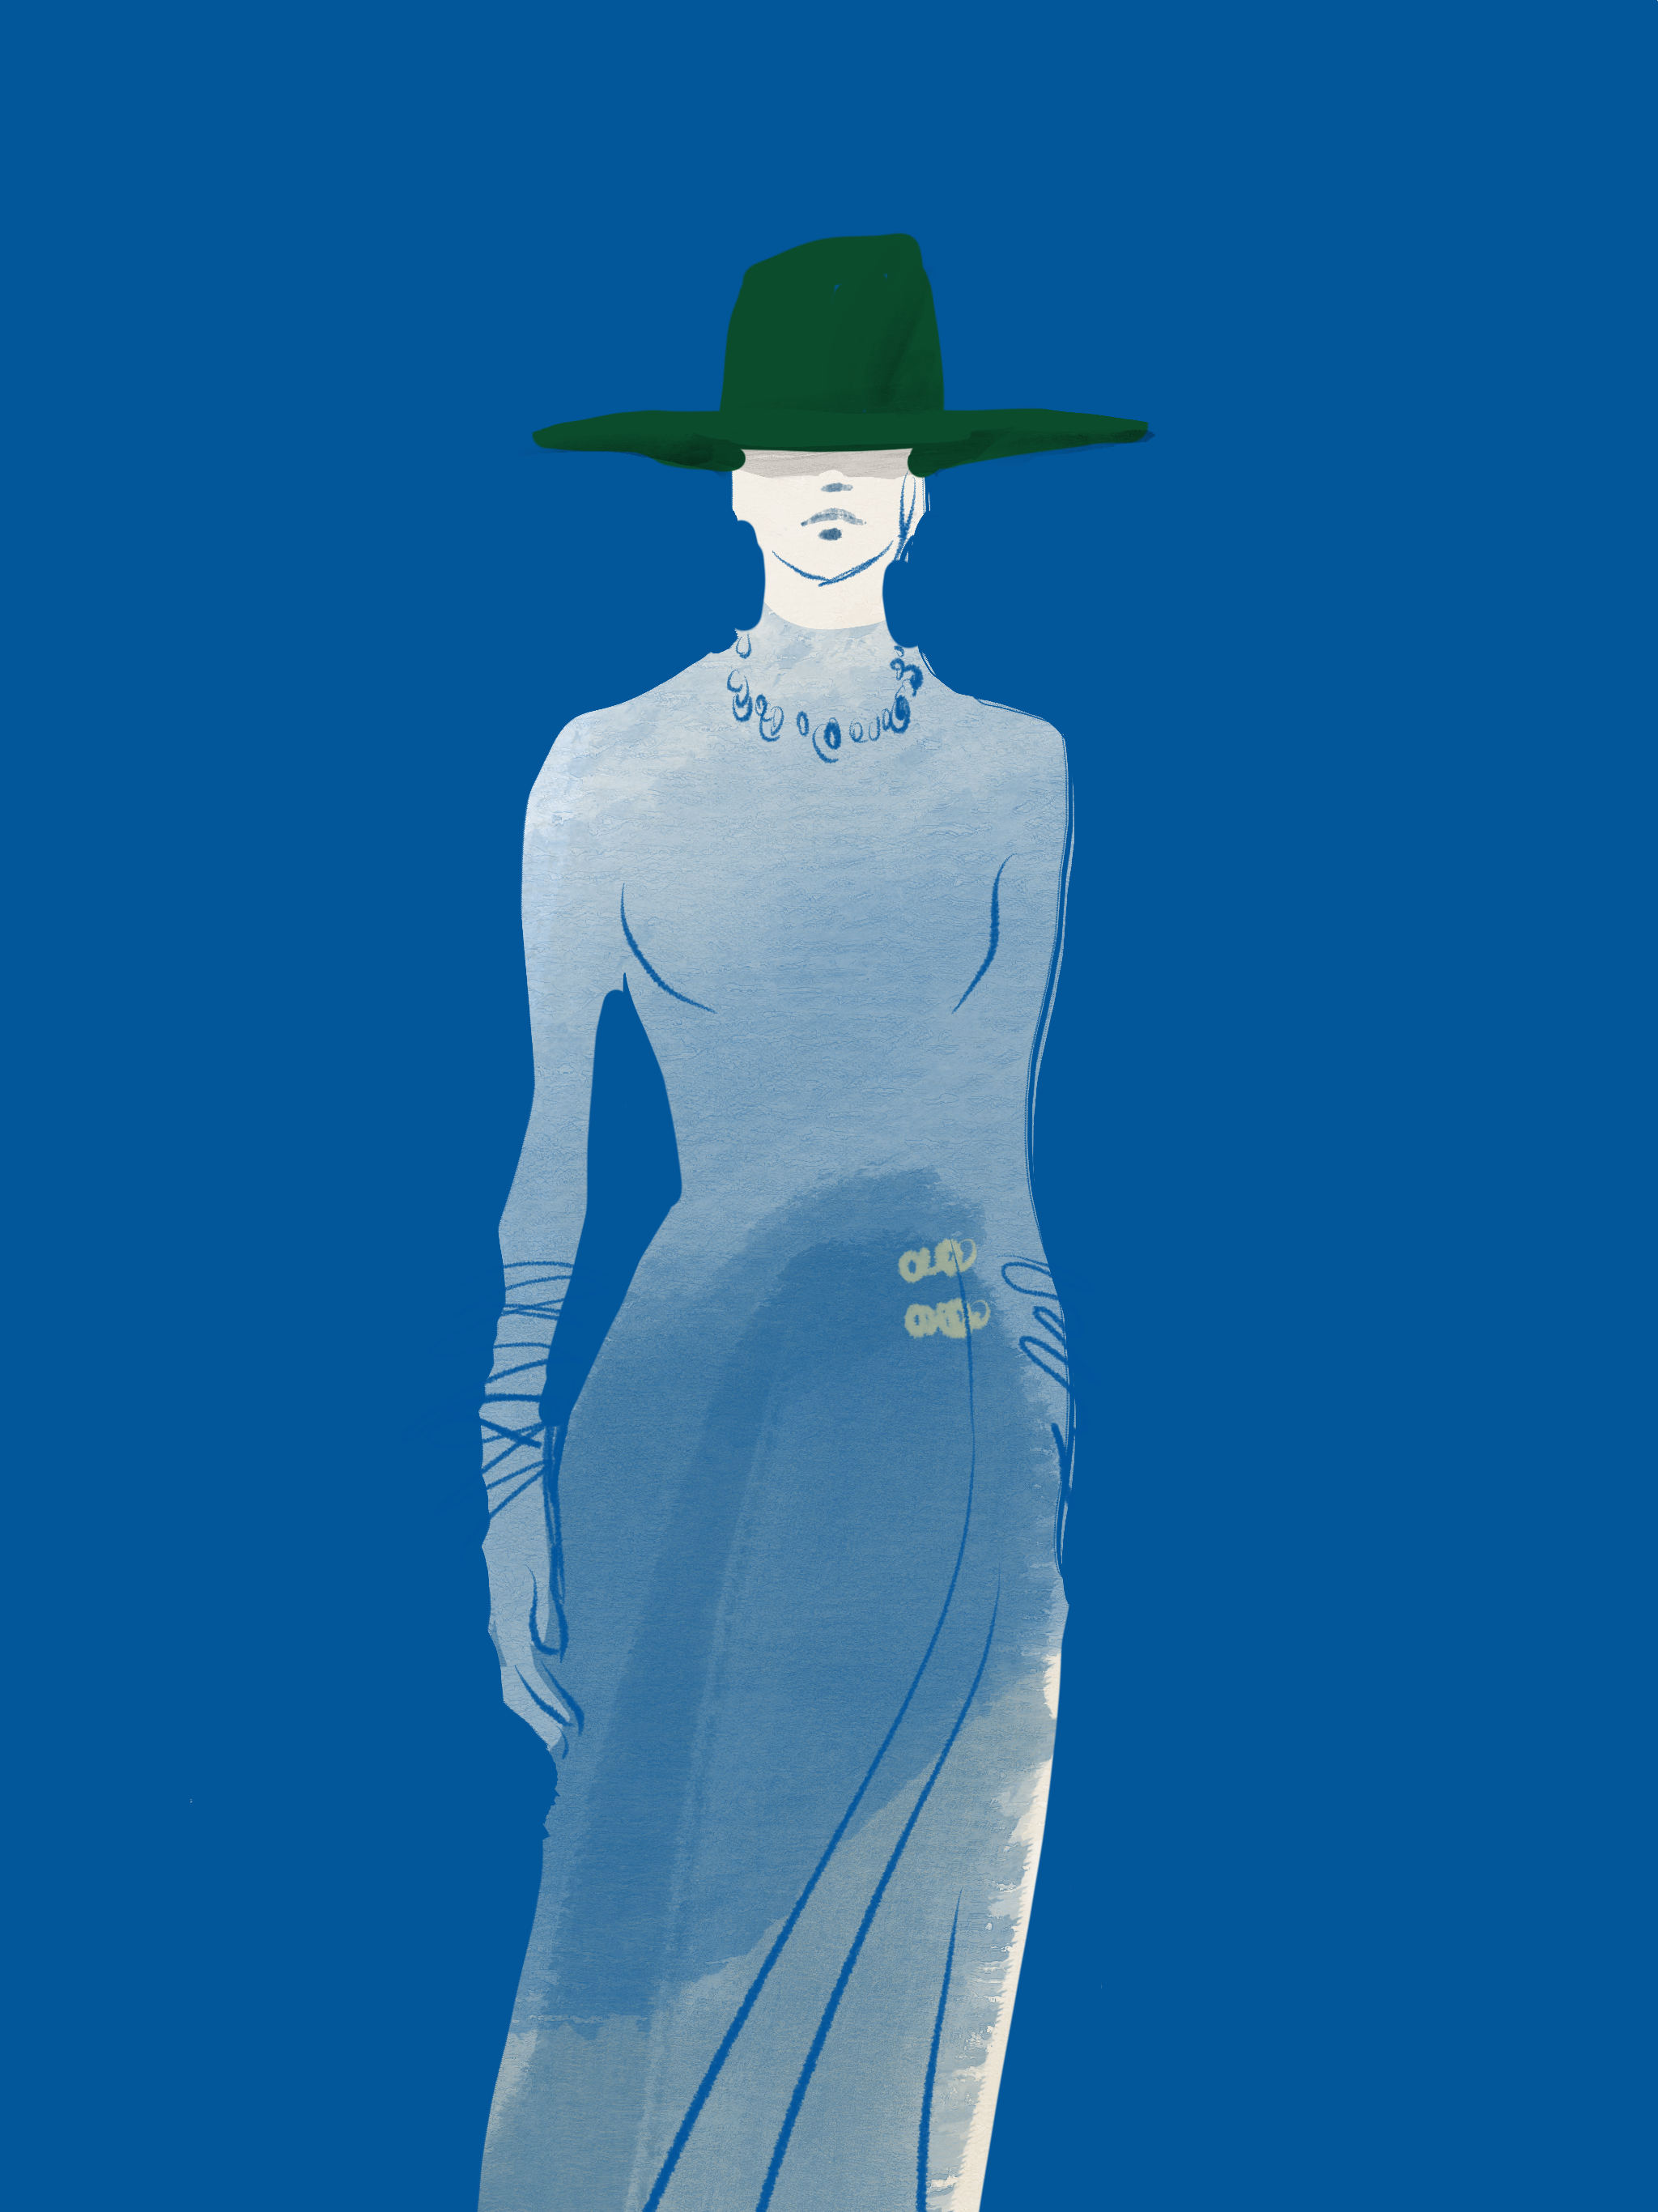 Green Hat, Fashion Runway Illustration by Silvana Mariani